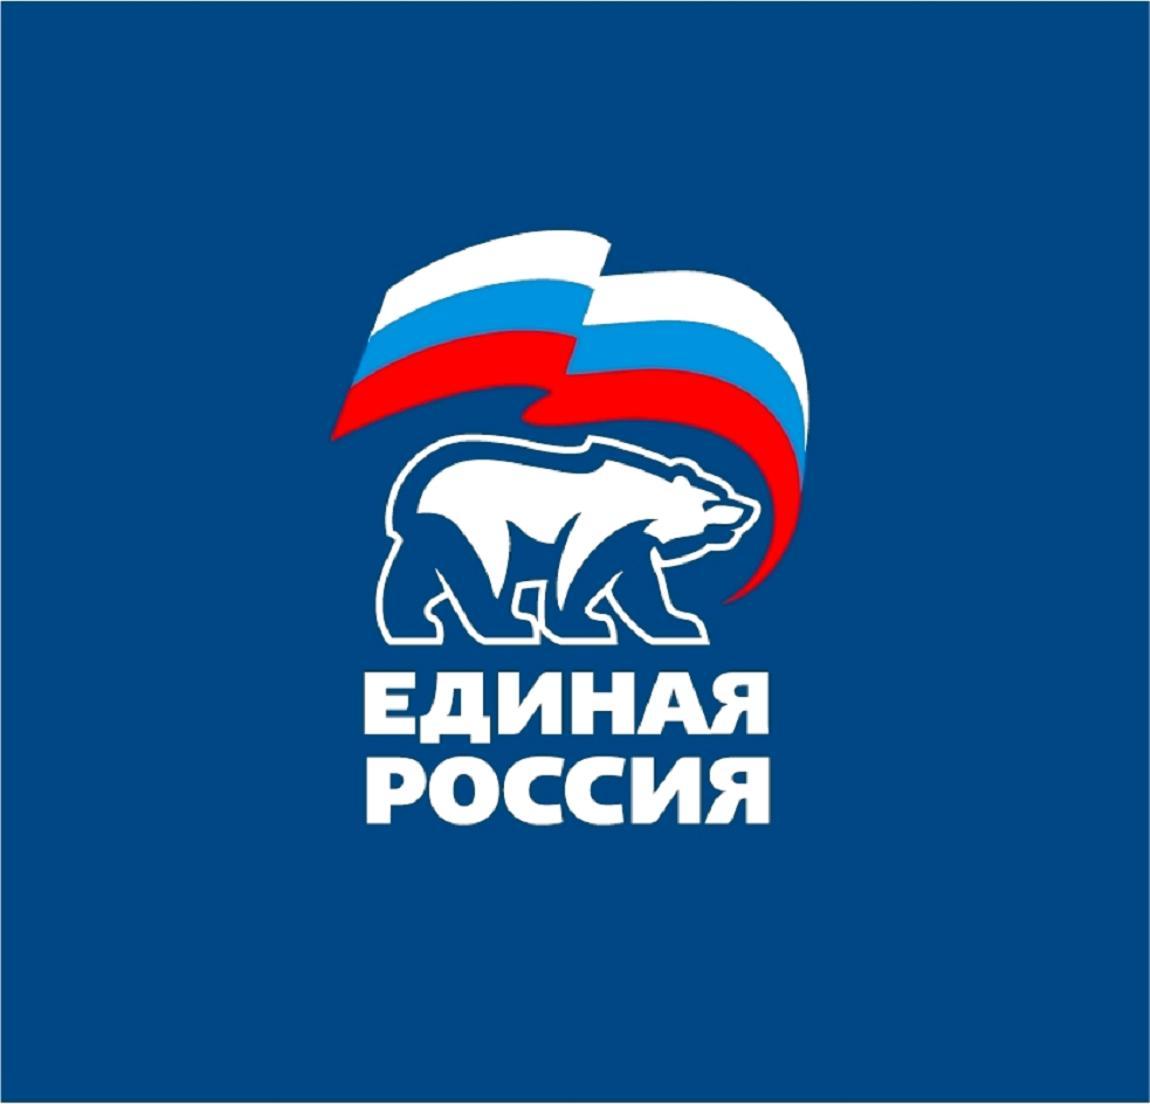 http://02varvara.files.wordpress.com/2009/12/yedinaya-rossiya-united-russia.jpg